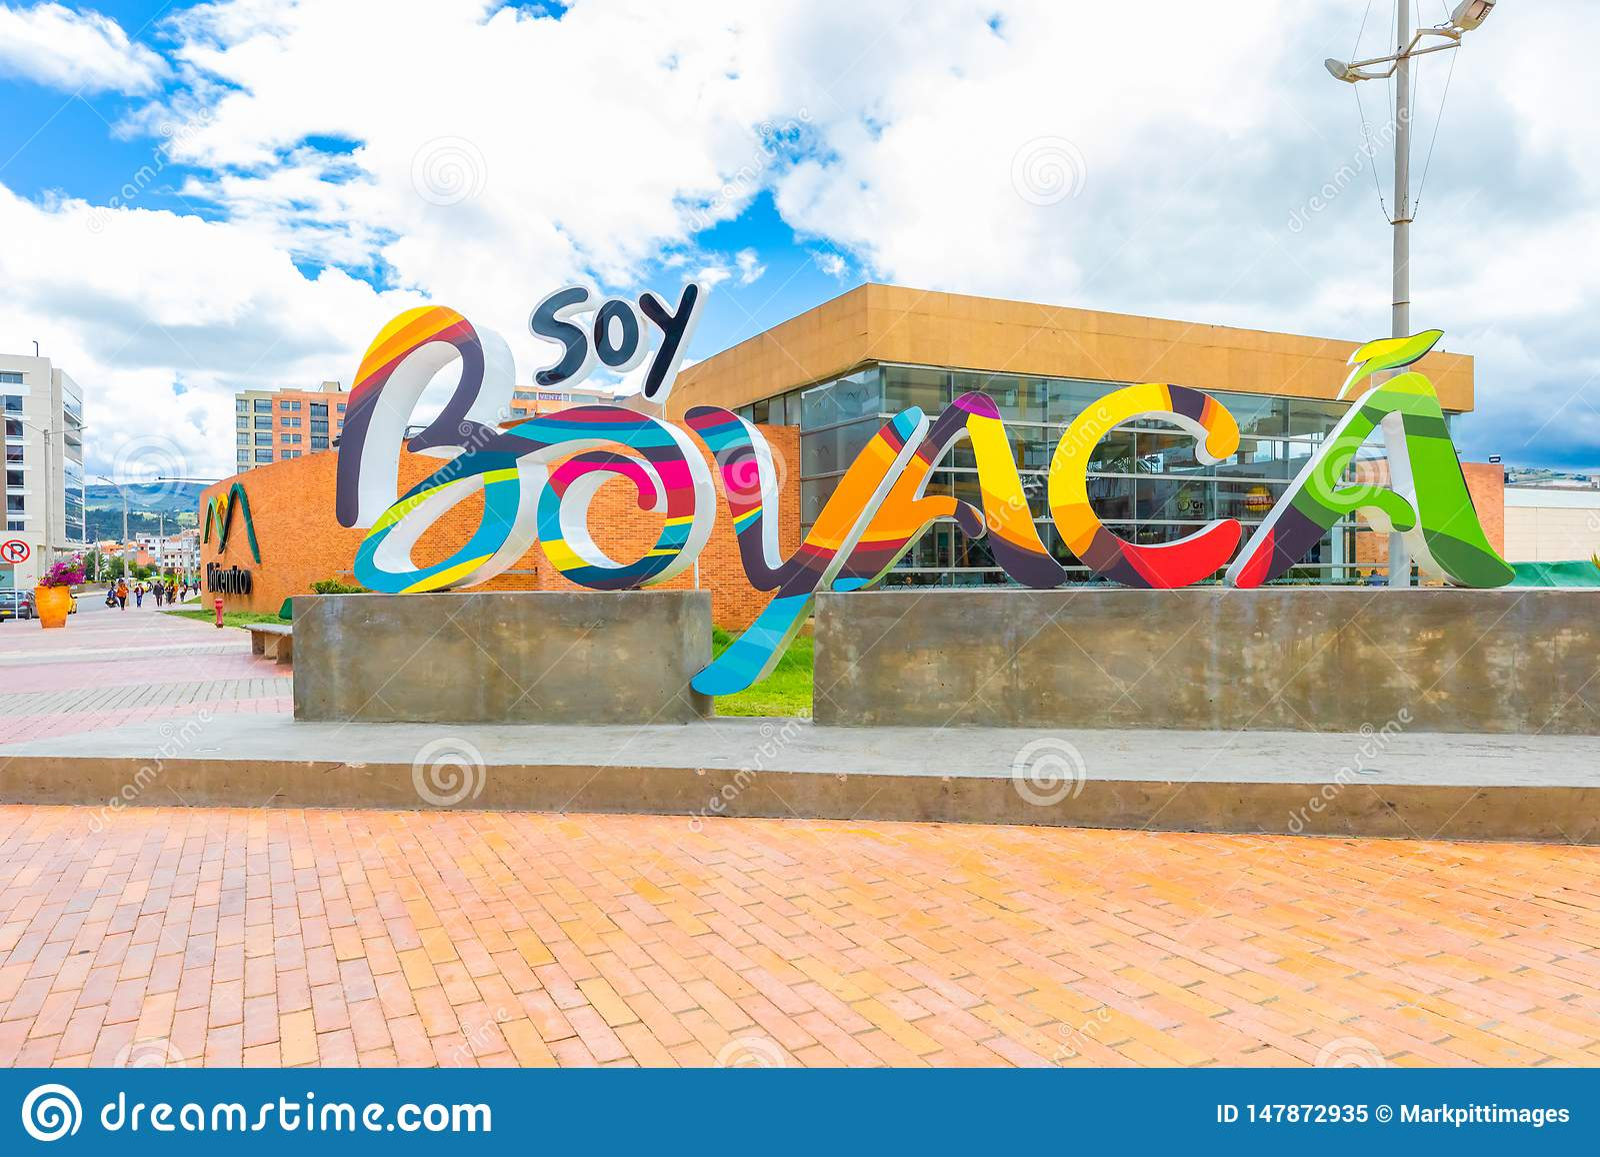 Tunja City Boyaca Region Of Colombia Colored Sign Editorial Image